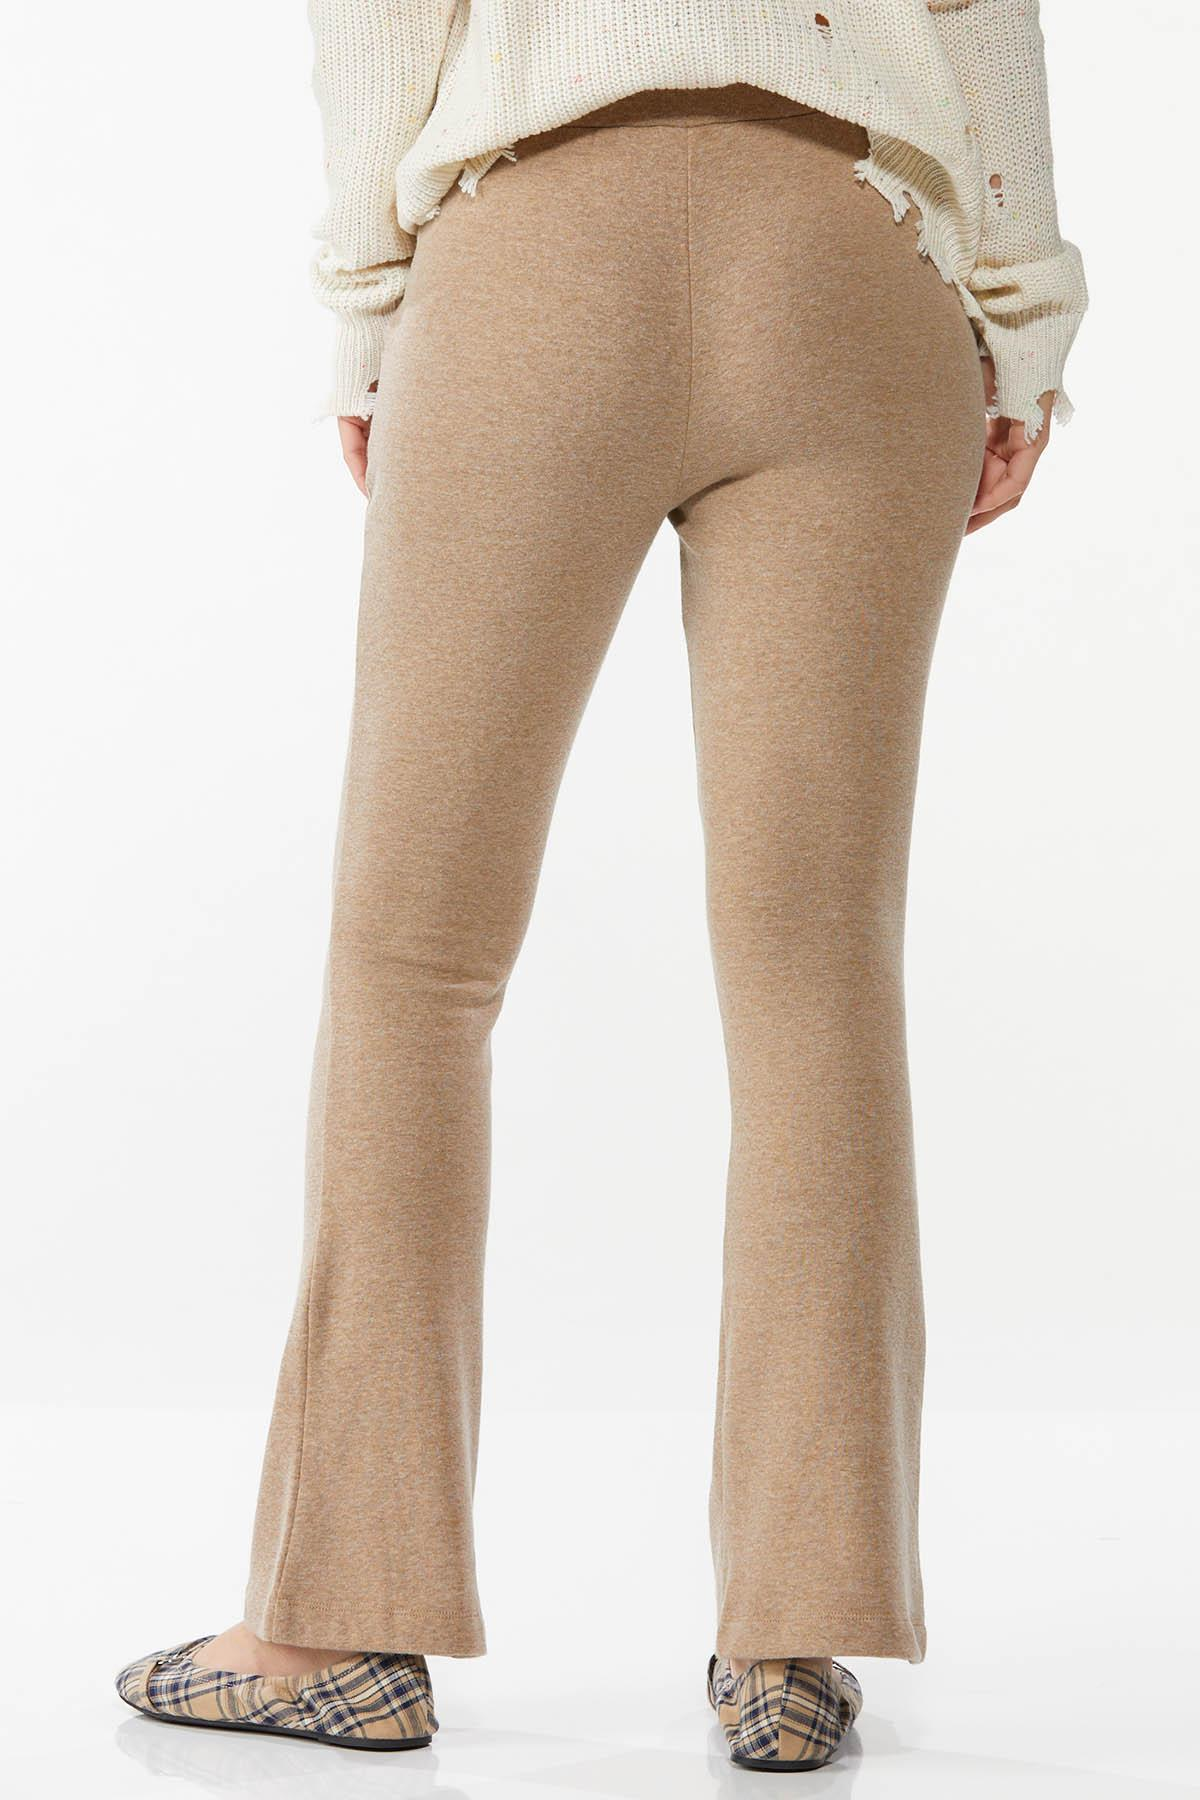 Petite Tan Fleece Pants (Item #44773409)